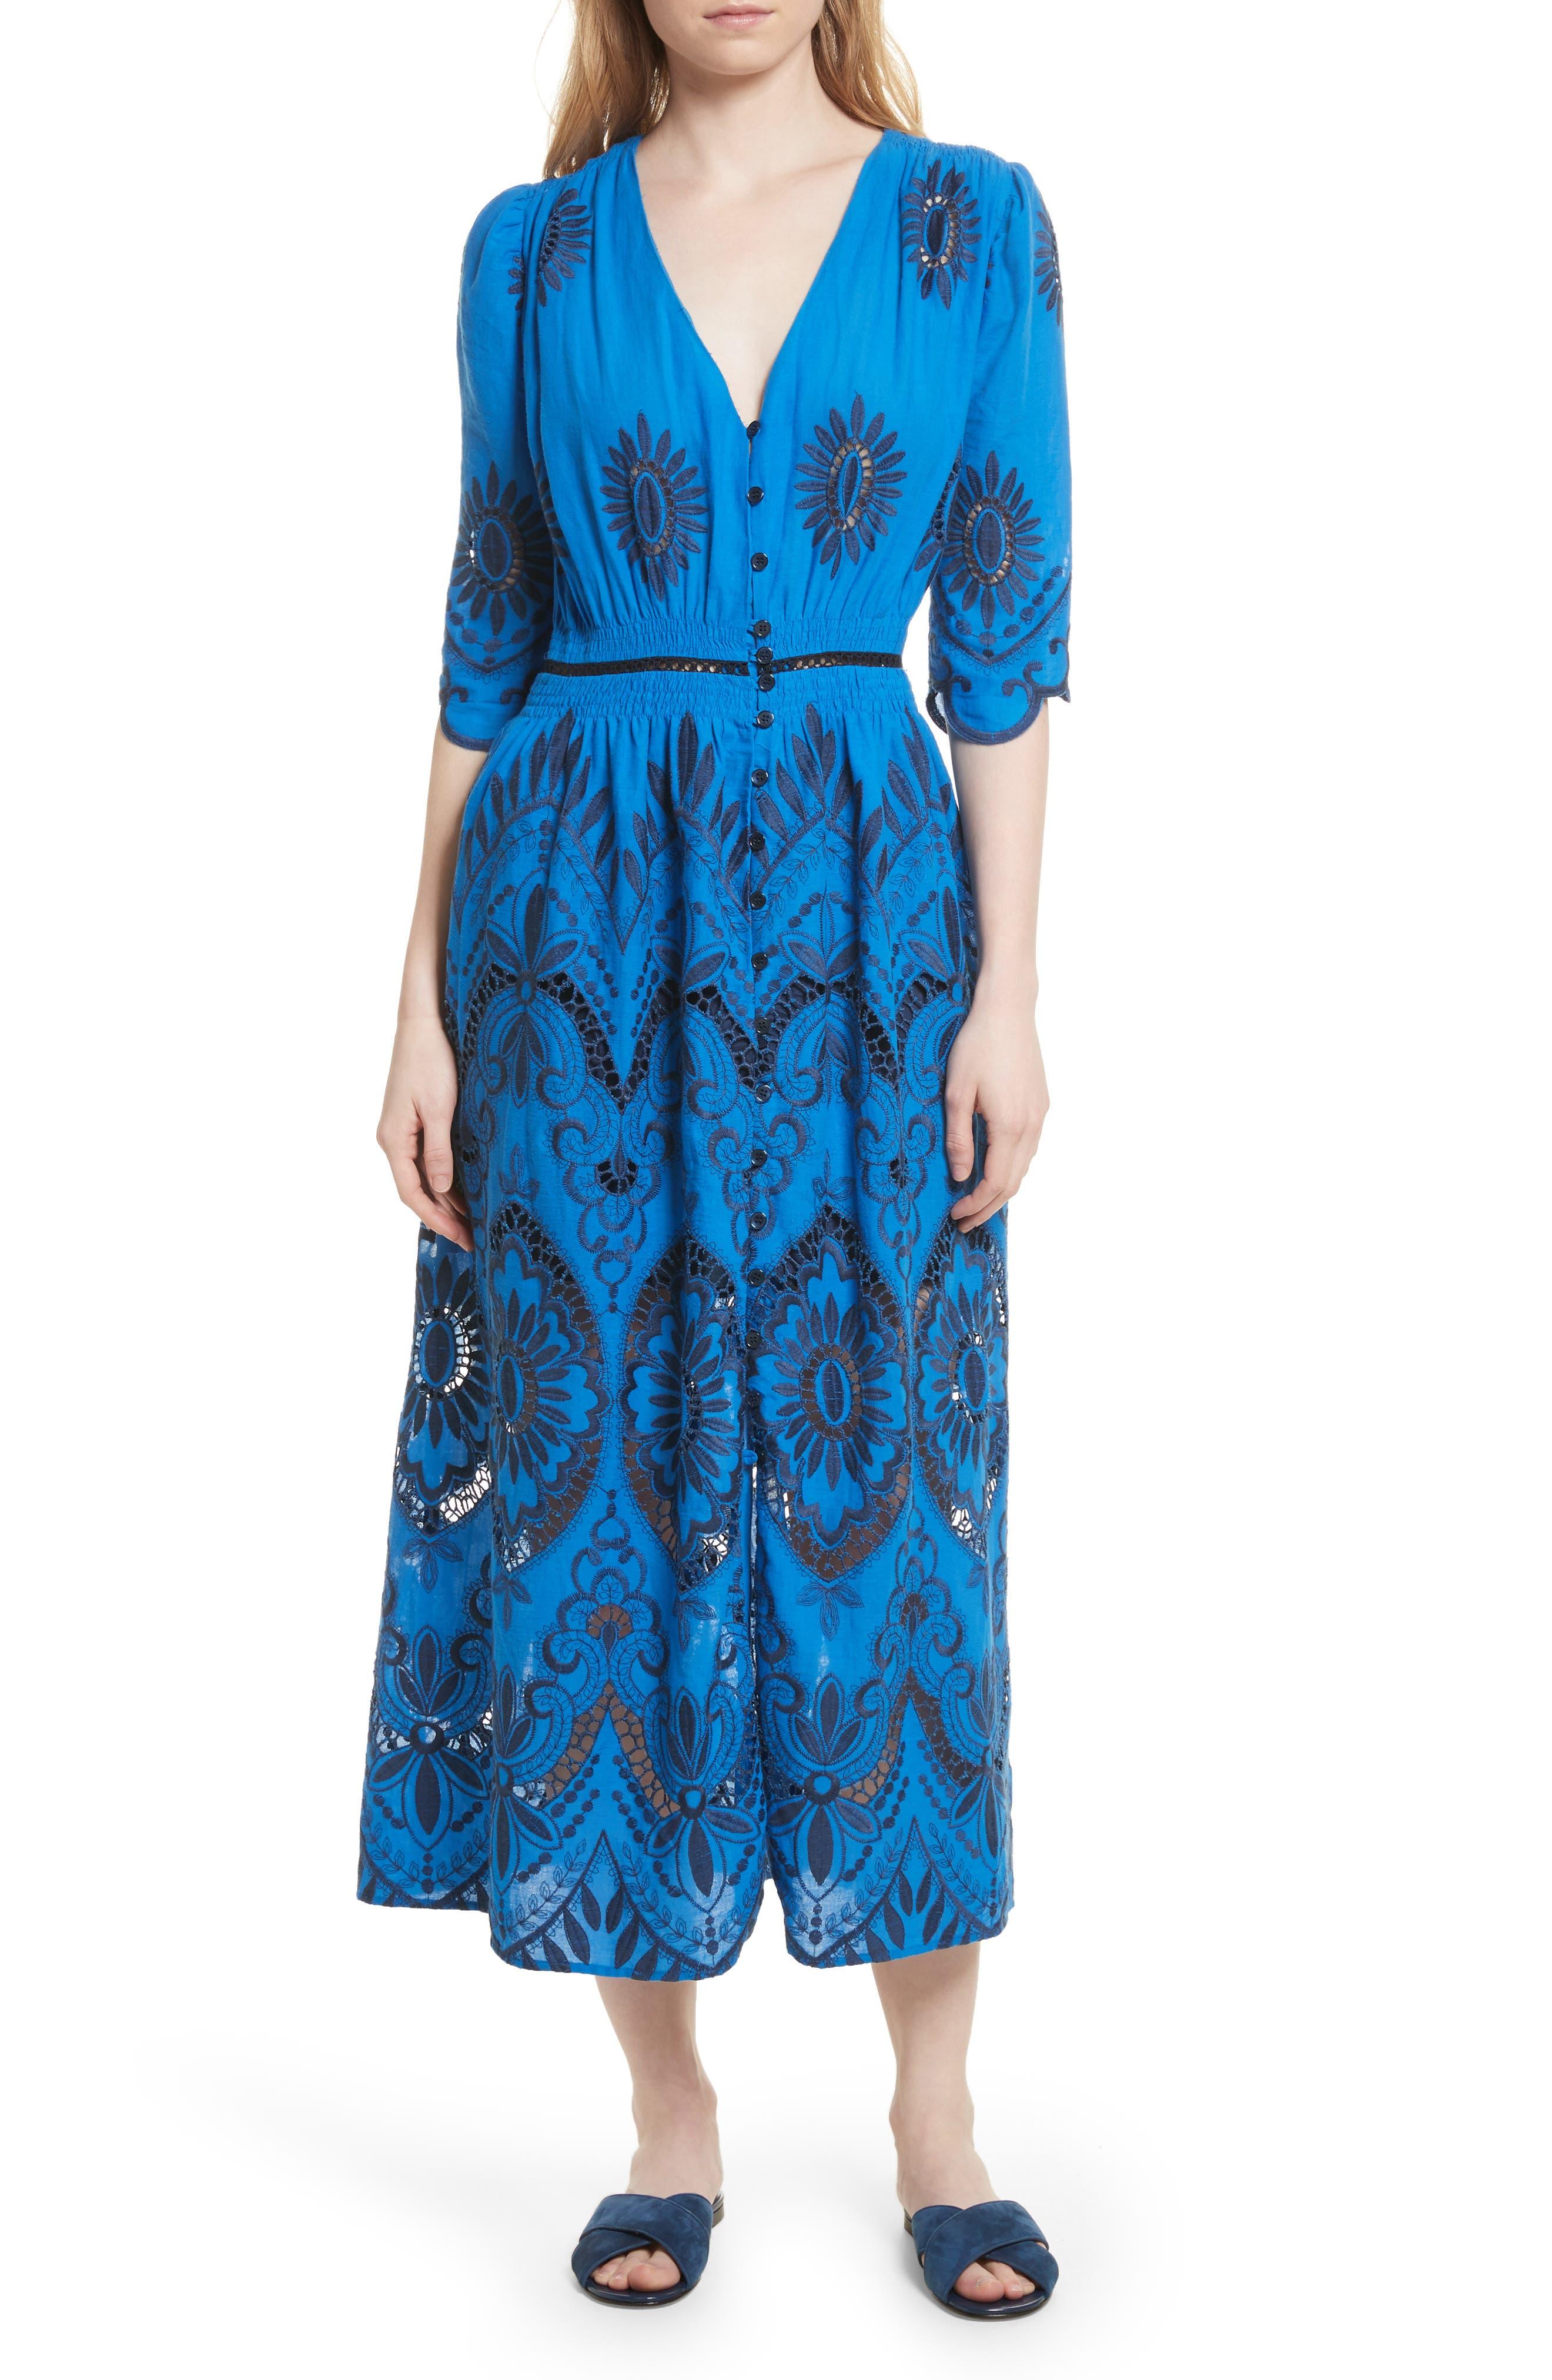 Cotton Eyelet Maxi Dress,                         Main,                         color, Blue/ Navy